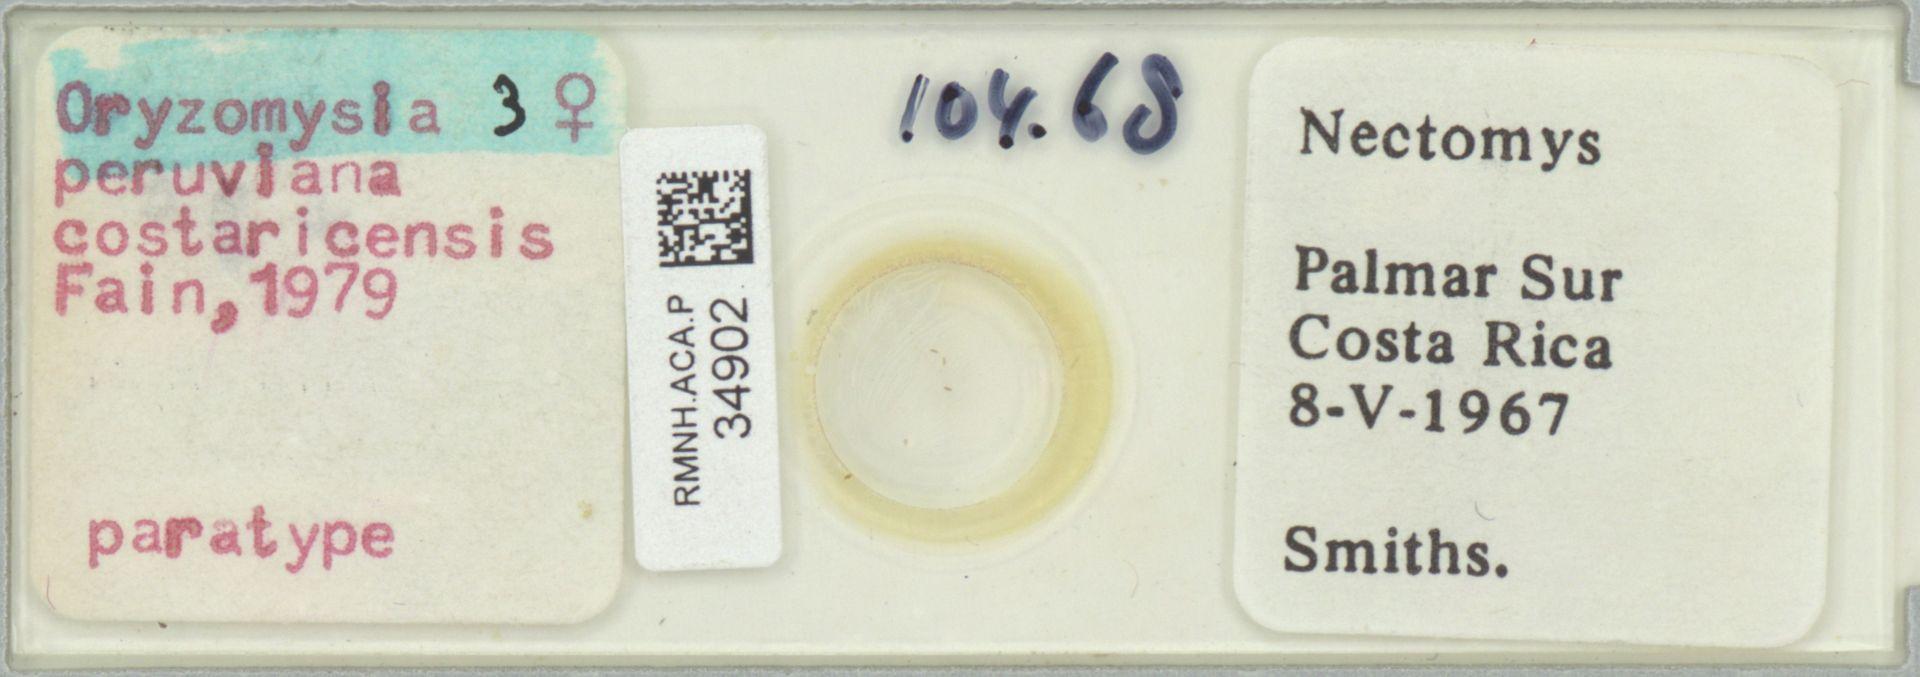 RMNH.ACA.P.34902 | Oryzomysia peruviana costaricensis Fain, 1979